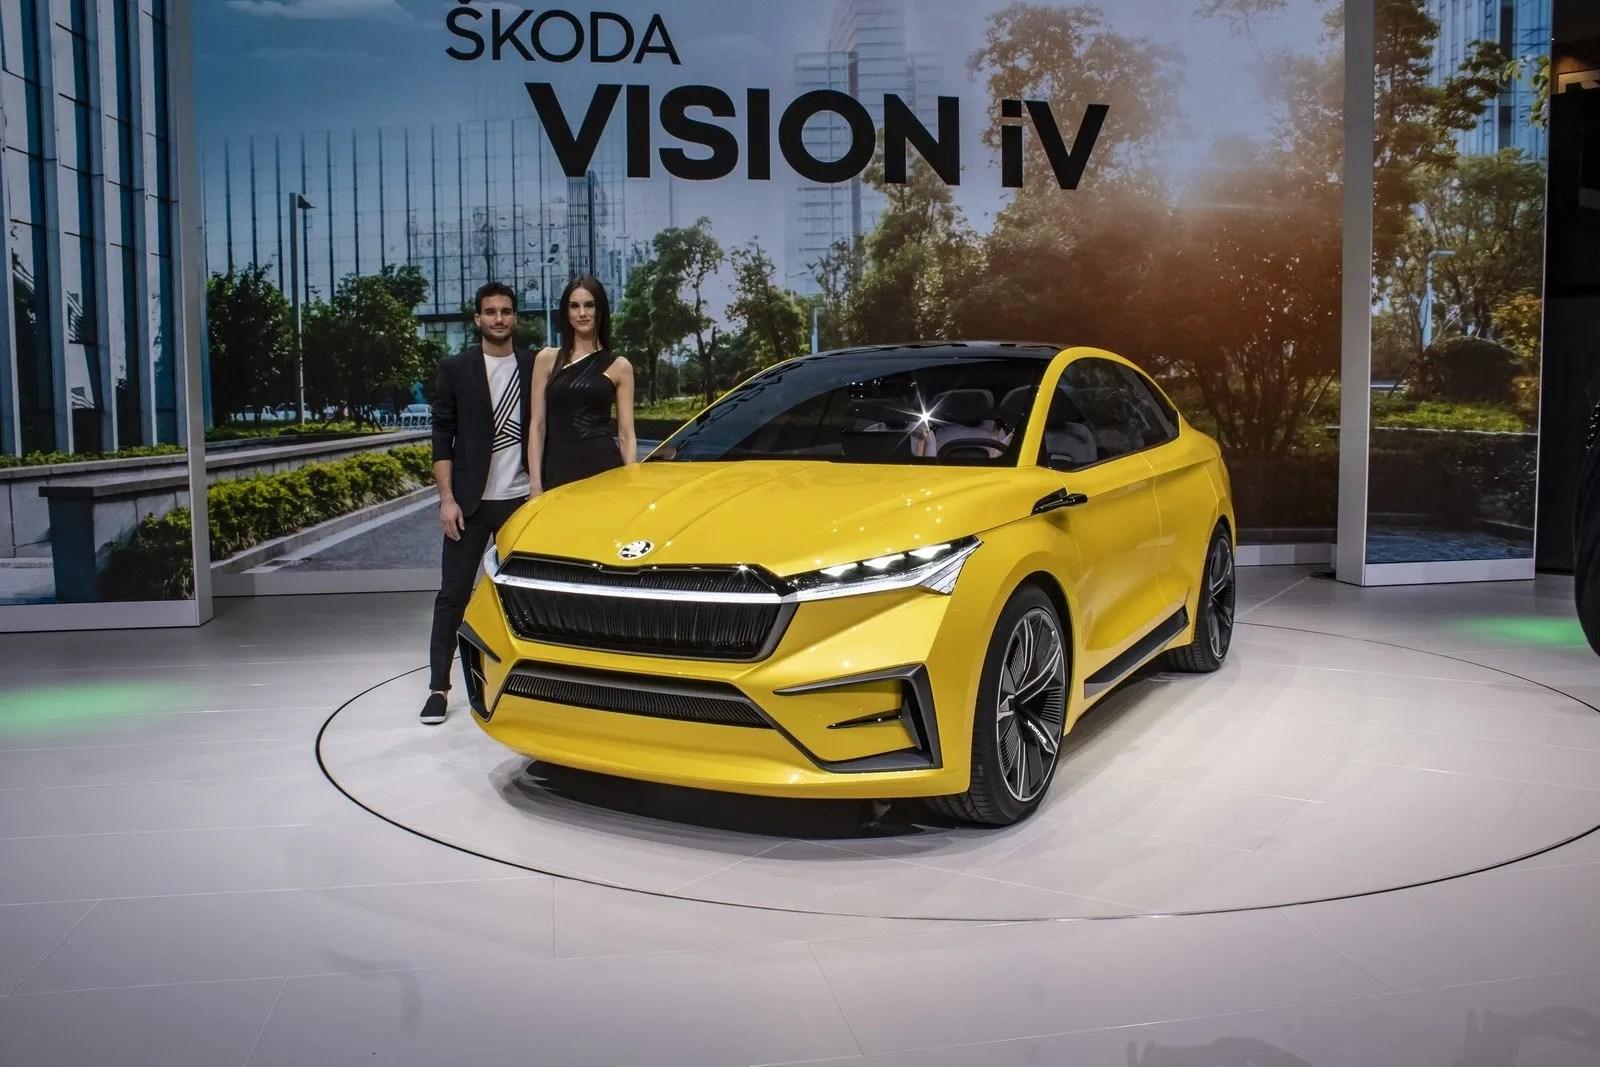 2019 Skoda Vision Iv Concept Top Speed